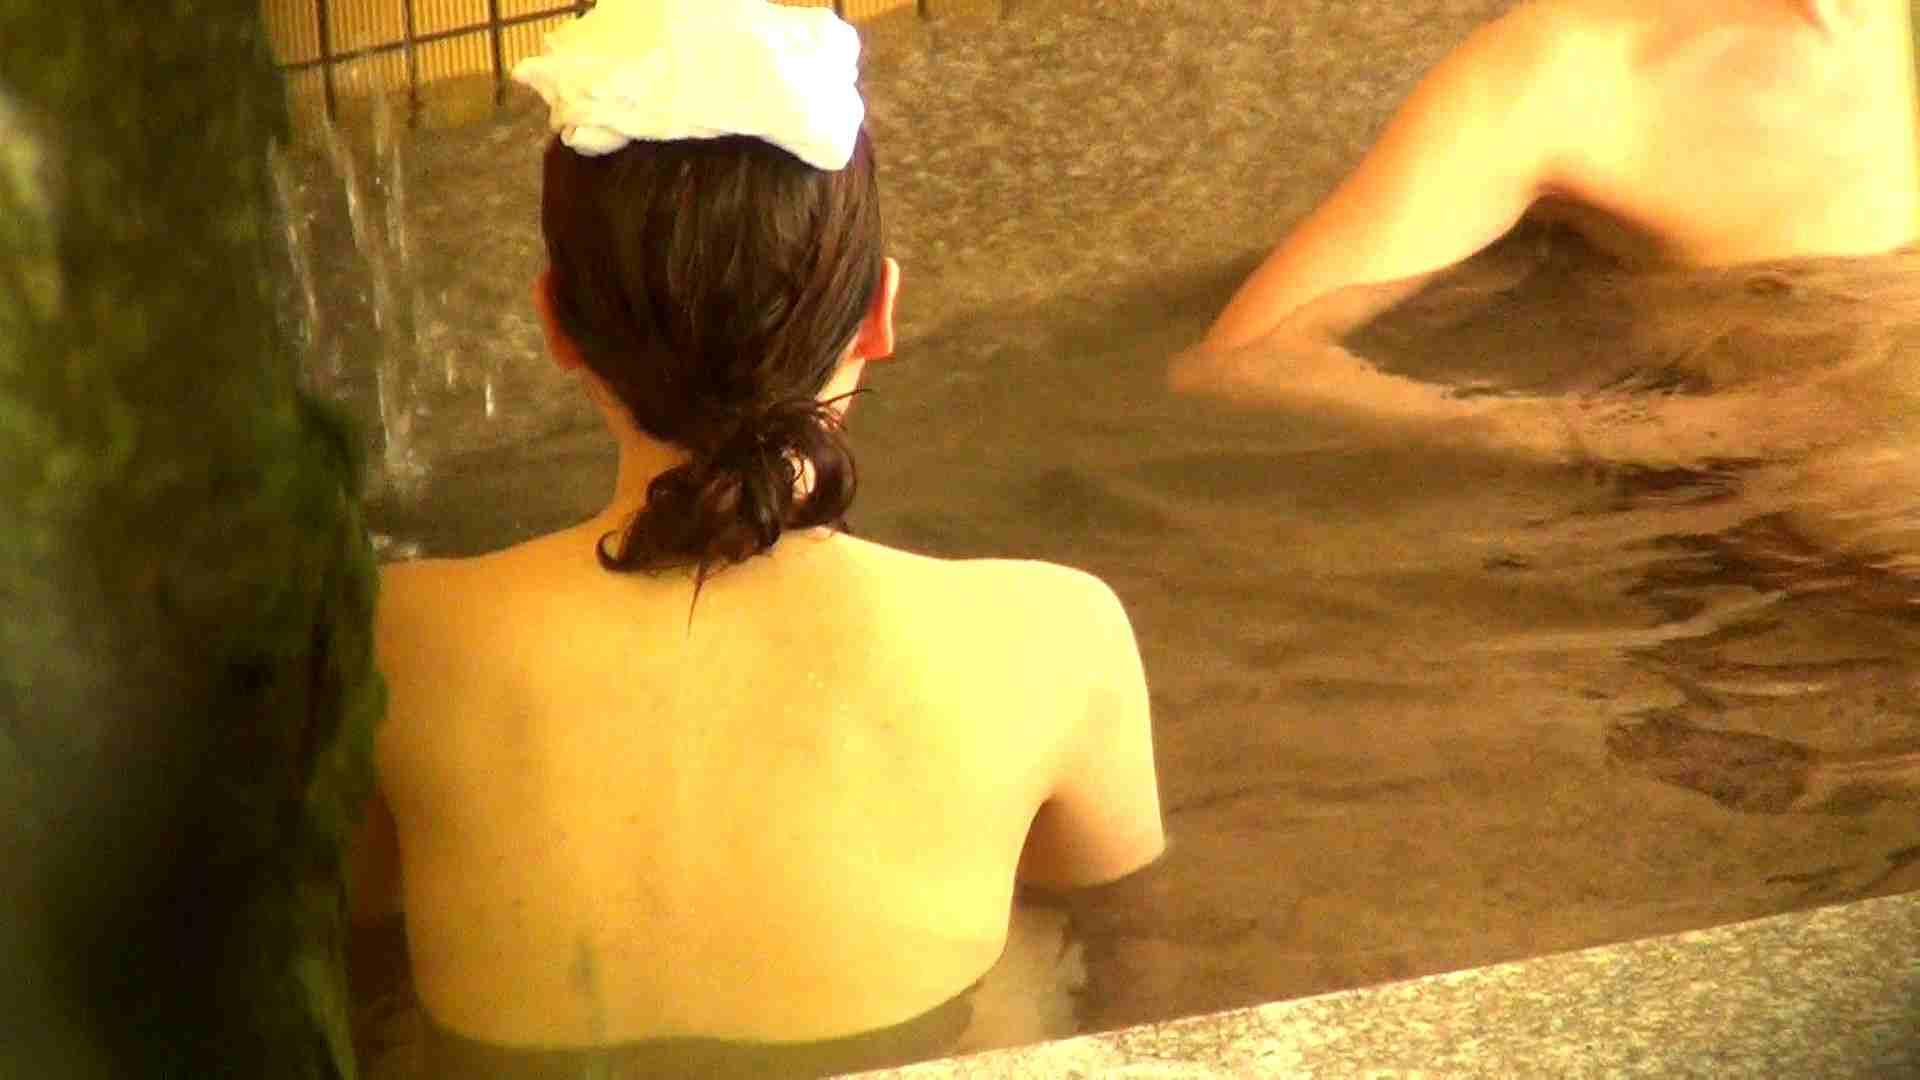 Aquaな露天風呂Vol.268 露天 隠し撮りオマンコ動画紹介 107画像 98